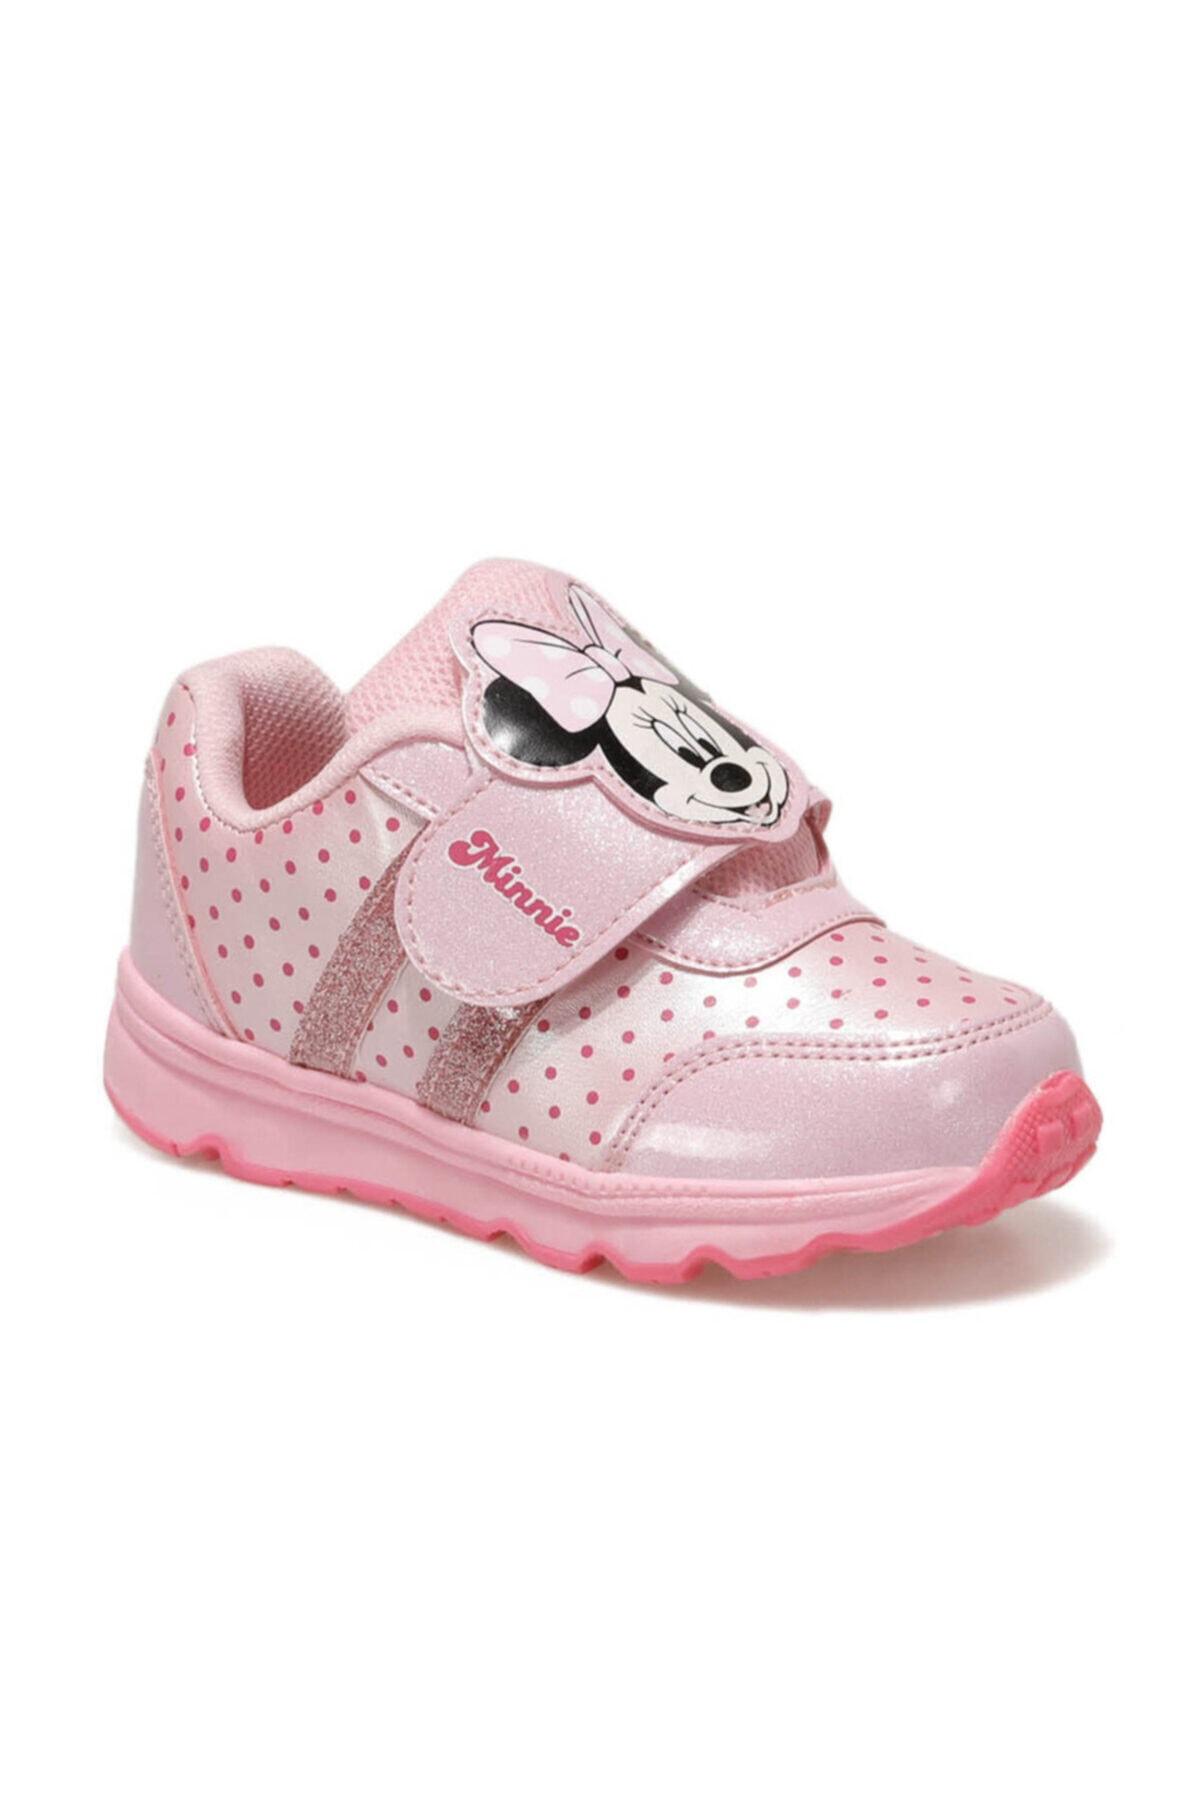 Mickey Mouse NIELY.B Pembe Kız Çocuk Ayakkabı 100561505 1